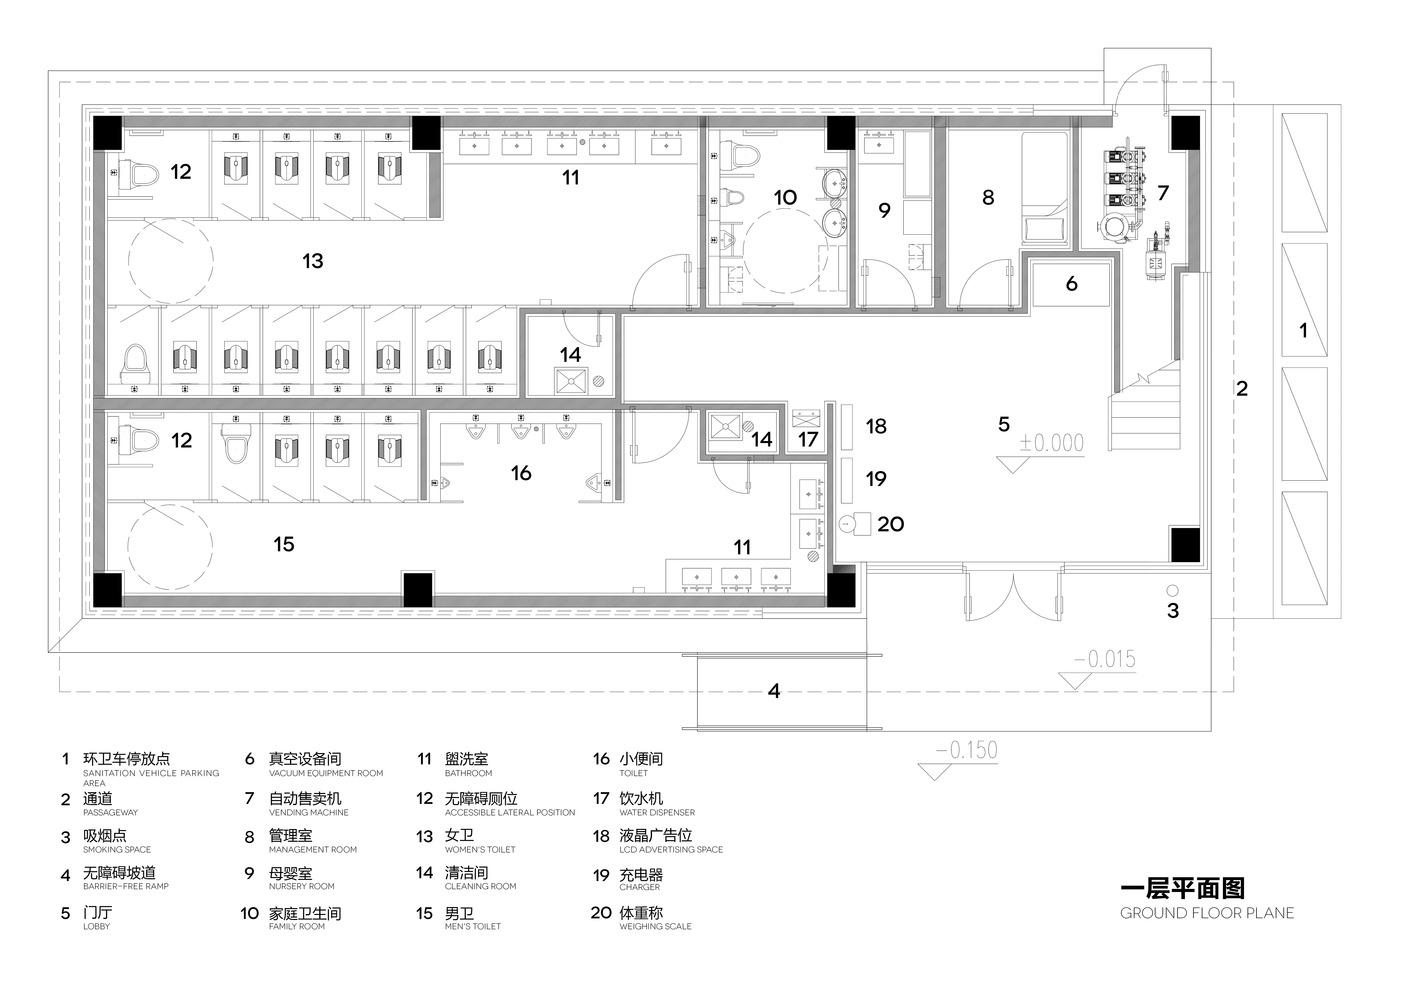 Floor Plan Public Toilet Design Plan